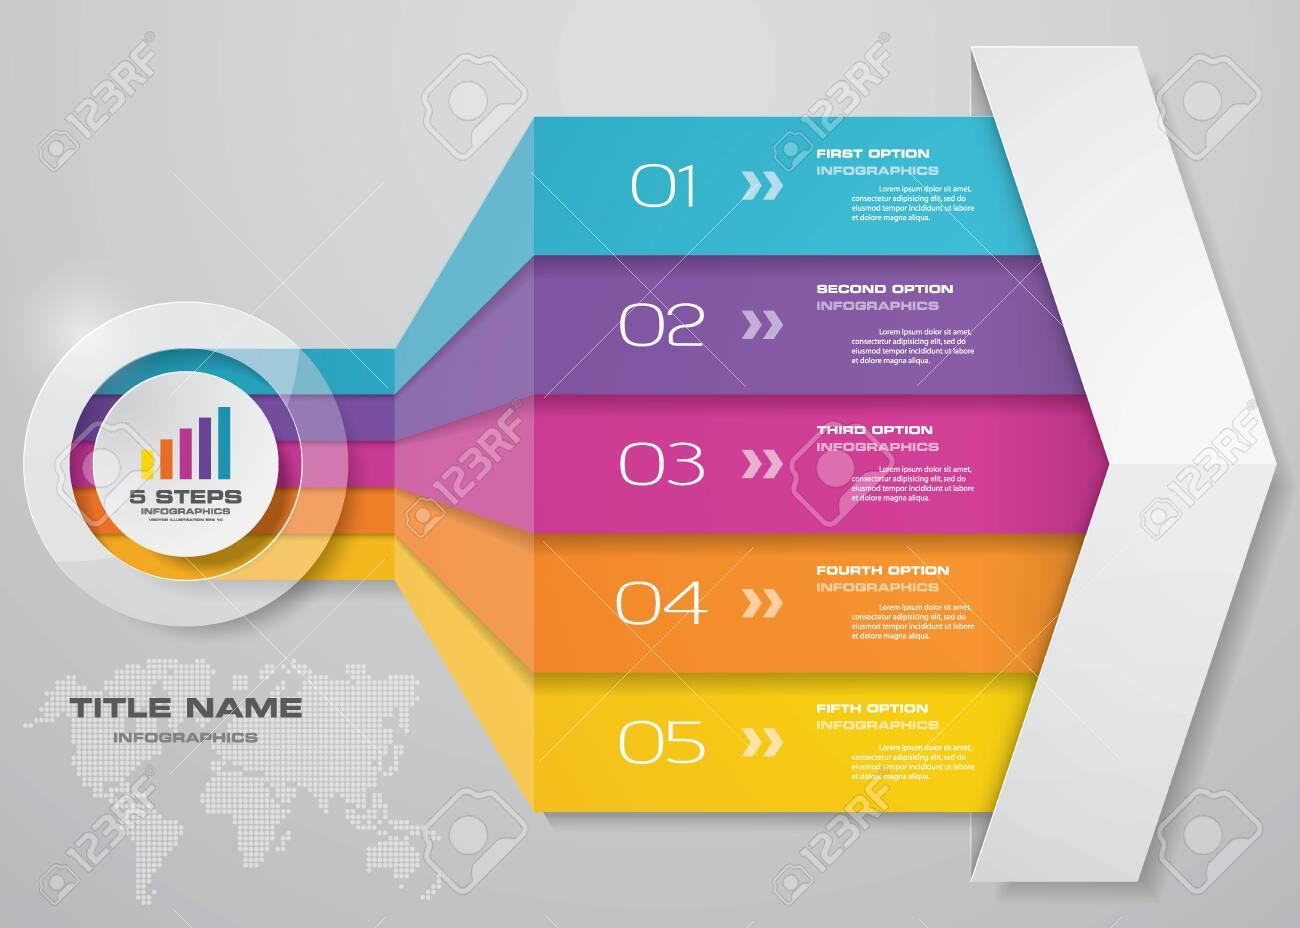 5 steps of arrow infografics template. for your presentation. - 133617962